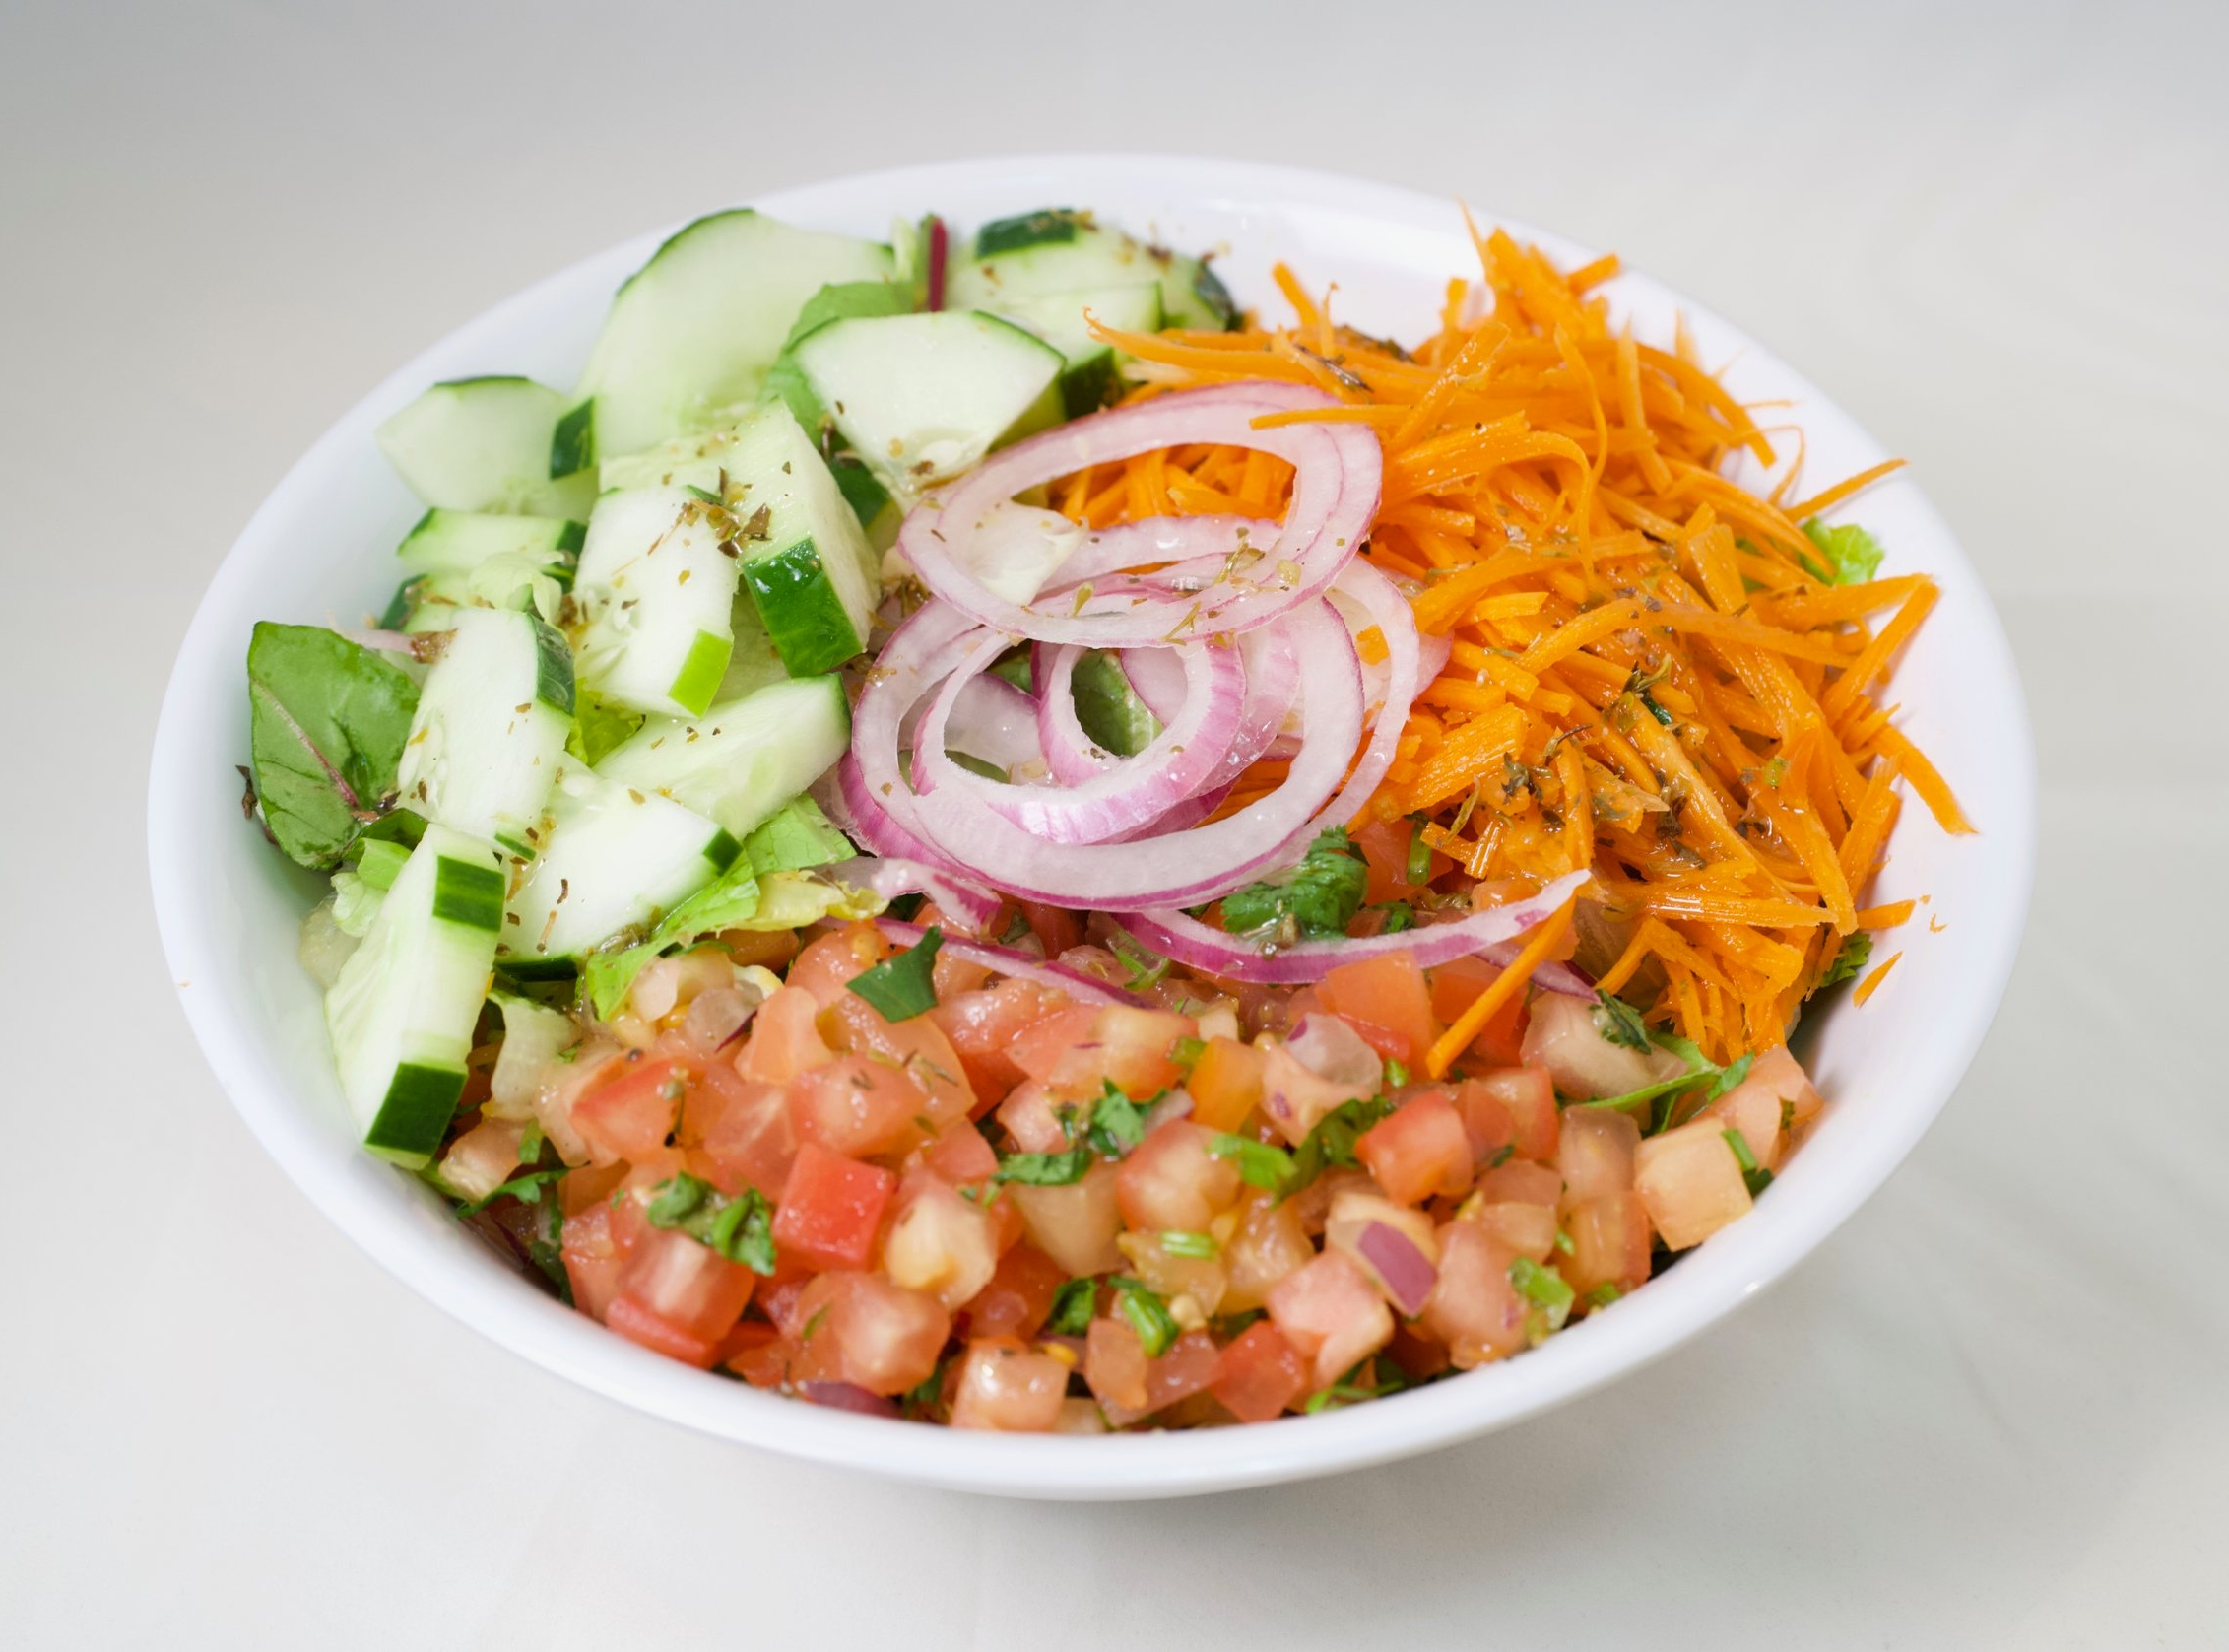 99. Energy Salad